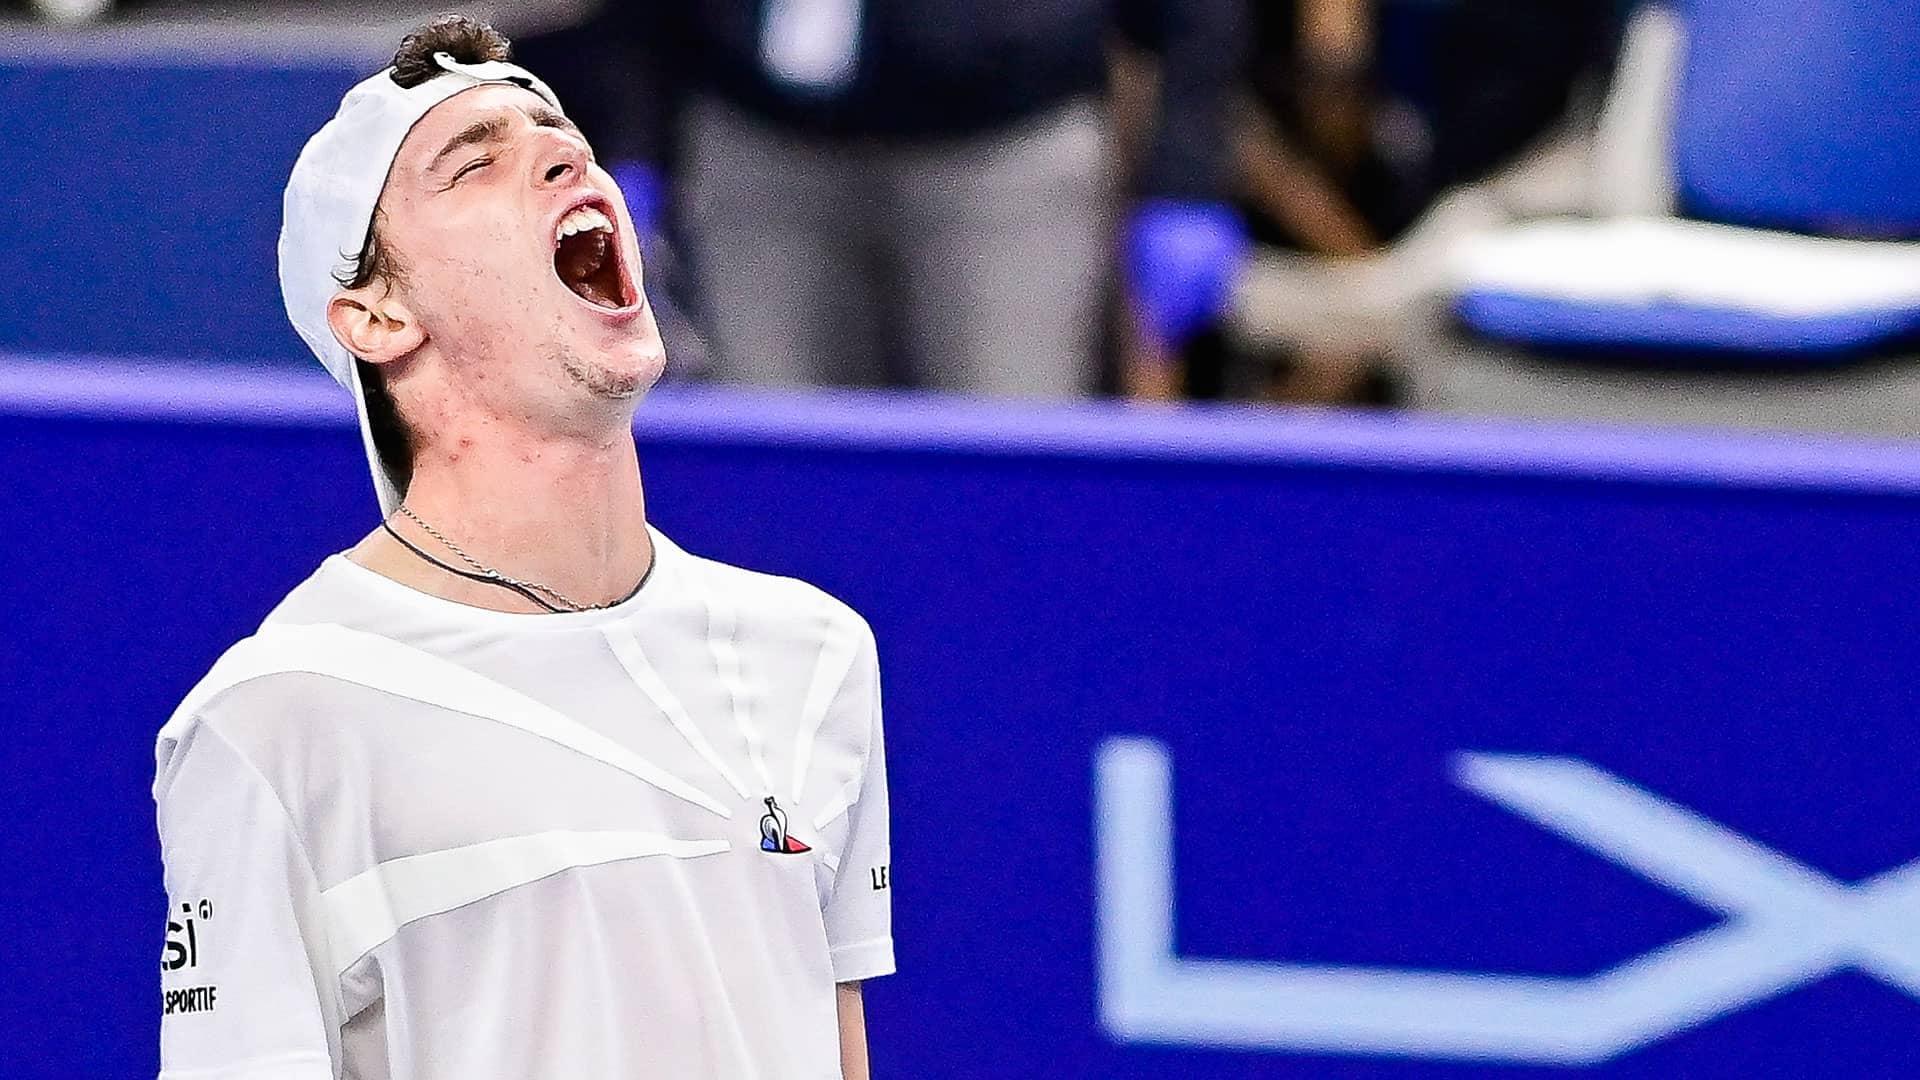 Ugo Humbert Saves 4 M.P. In Antwerp Comeback For Final Spot | ATP Tour |  Tennis